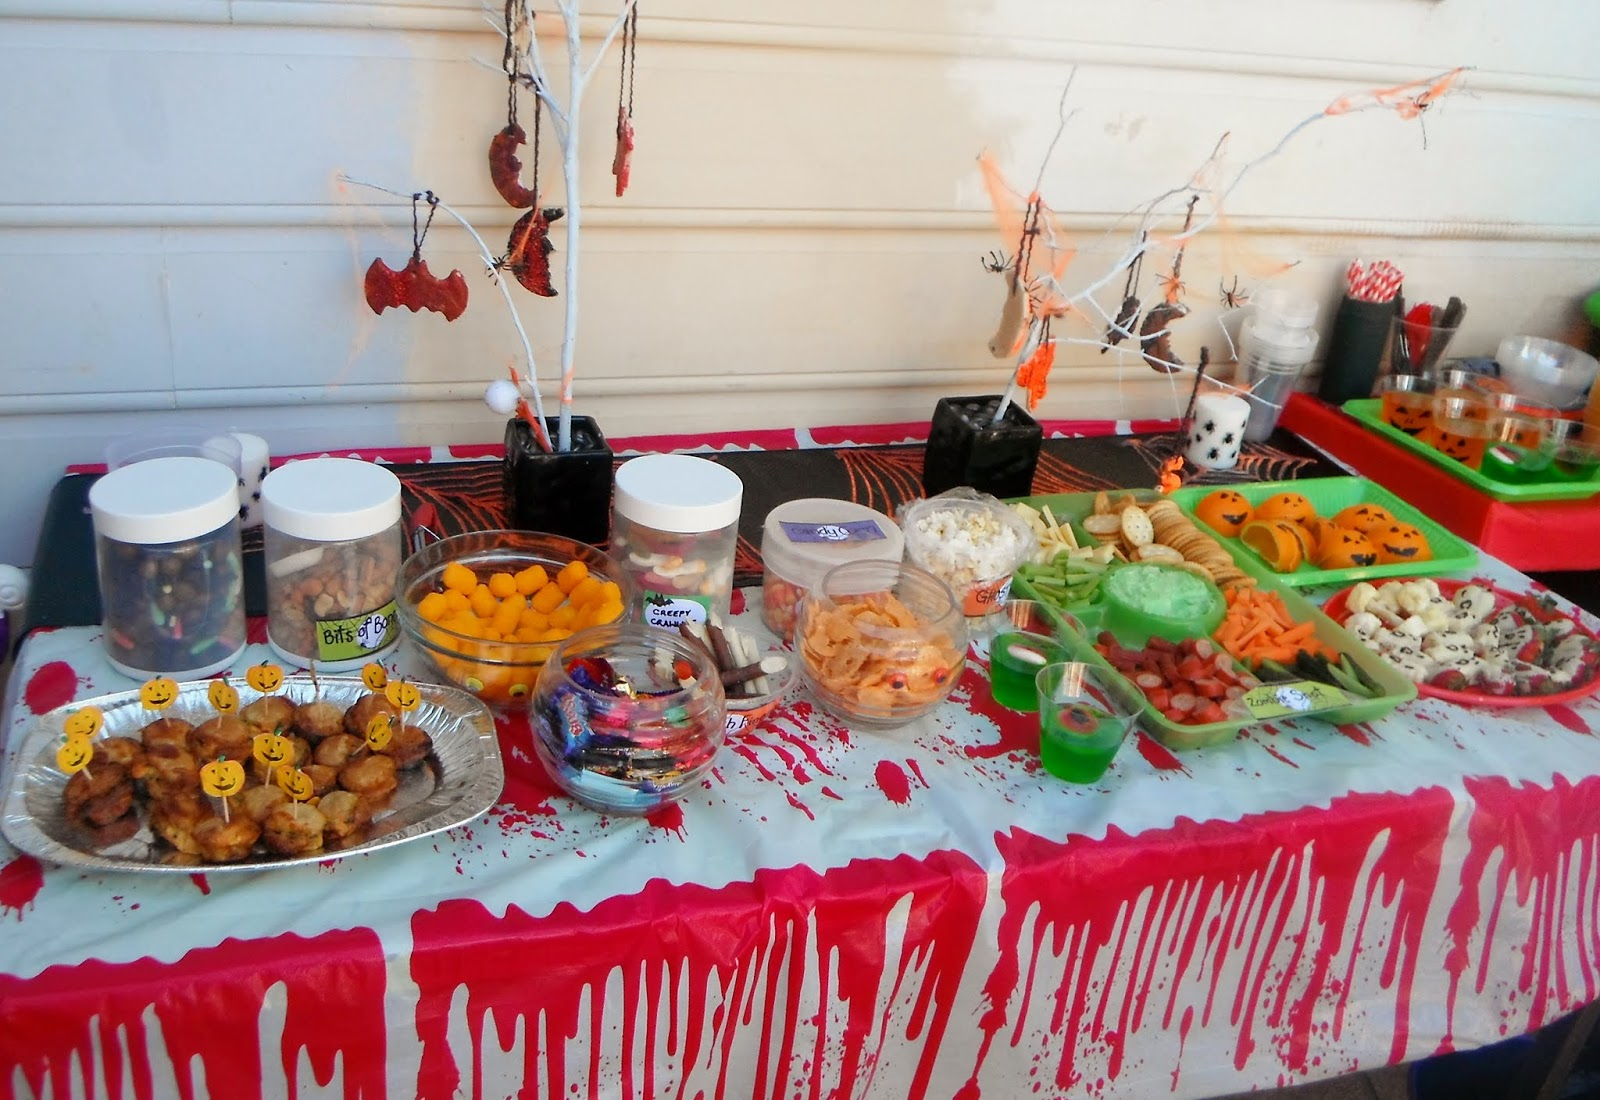 Kids halloween party decorations - Kids Halloween Party Decorations 32